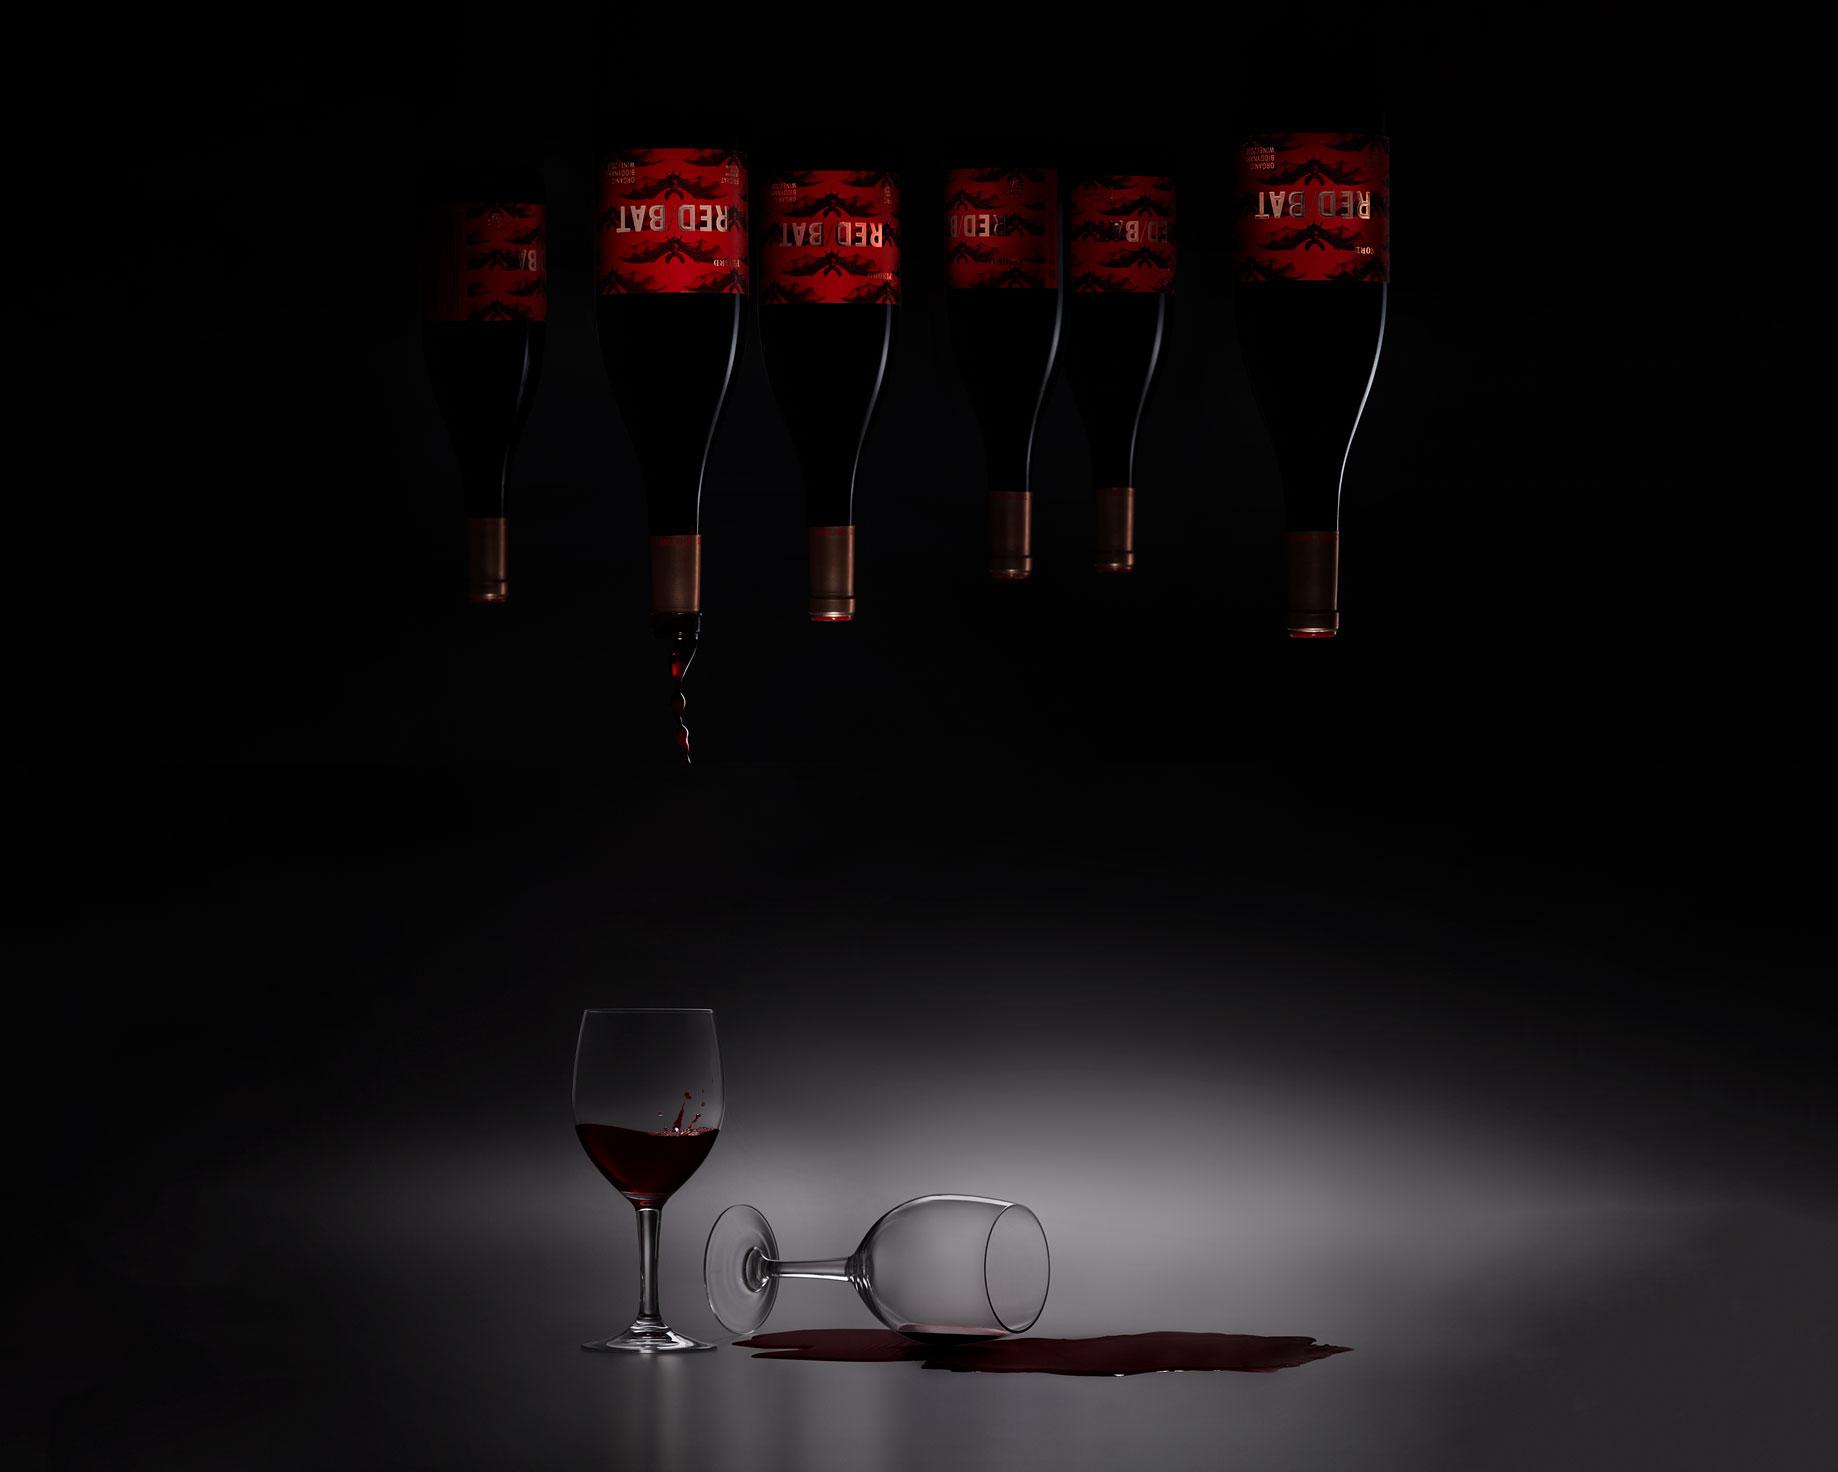 Pinord Red Bat vino diseño de etiqueta branding naming gran consumo packaging diseño gráfico Vibranding